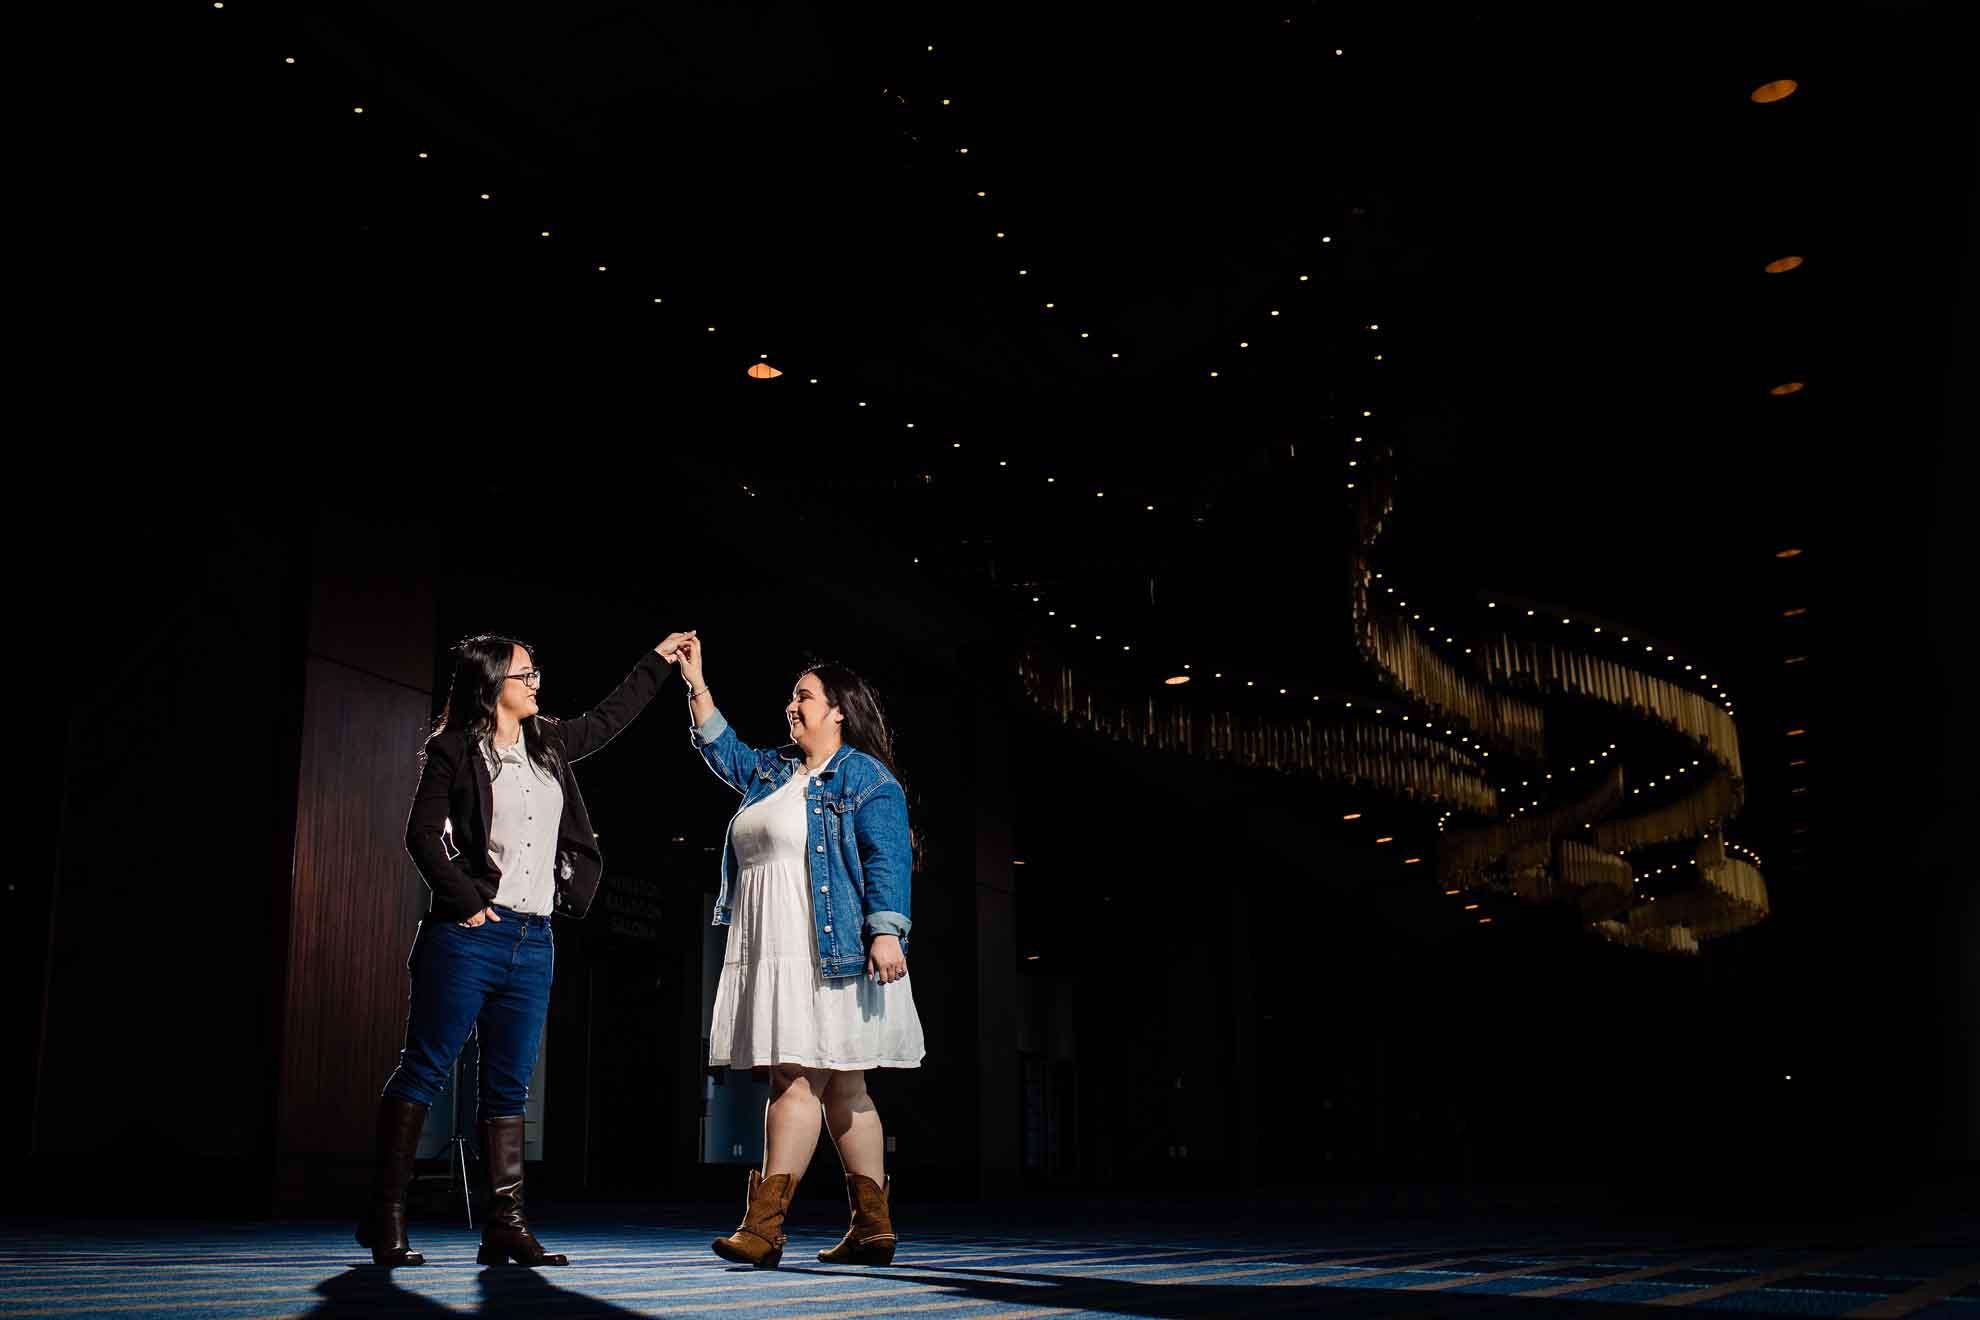 David Truong photography lesbian gay same-sex Huston USA city proposal bi-racial Dancing With Her (1)